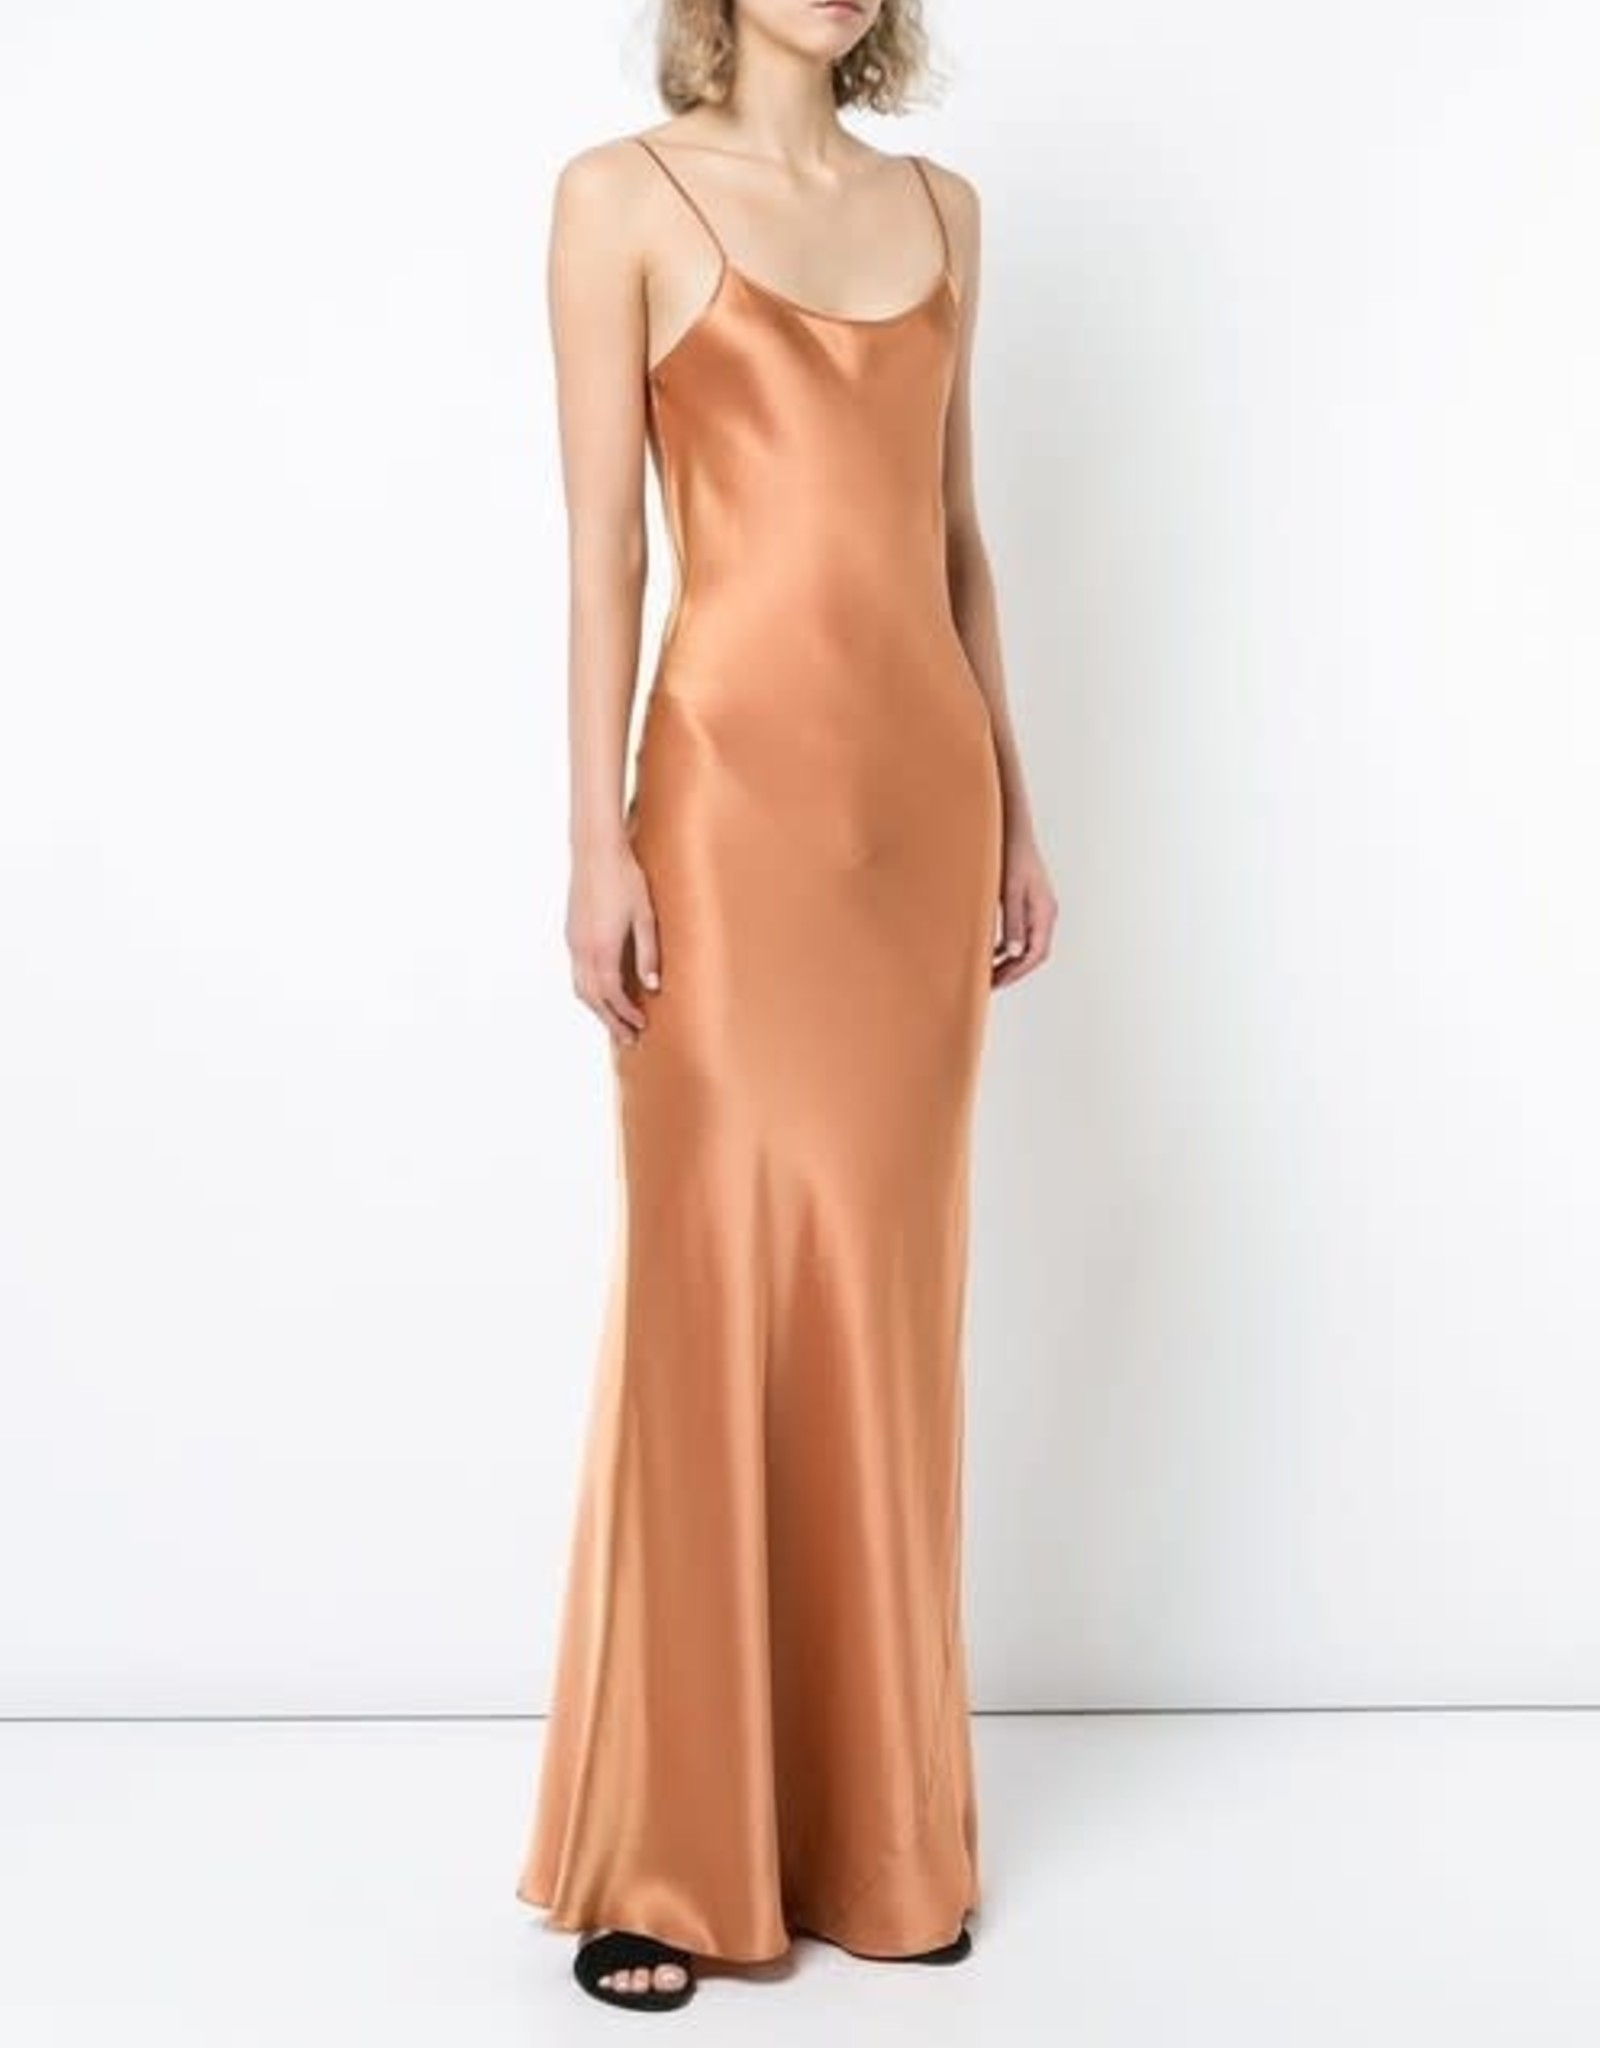 VOZ - The Charmeuse Slip Dress